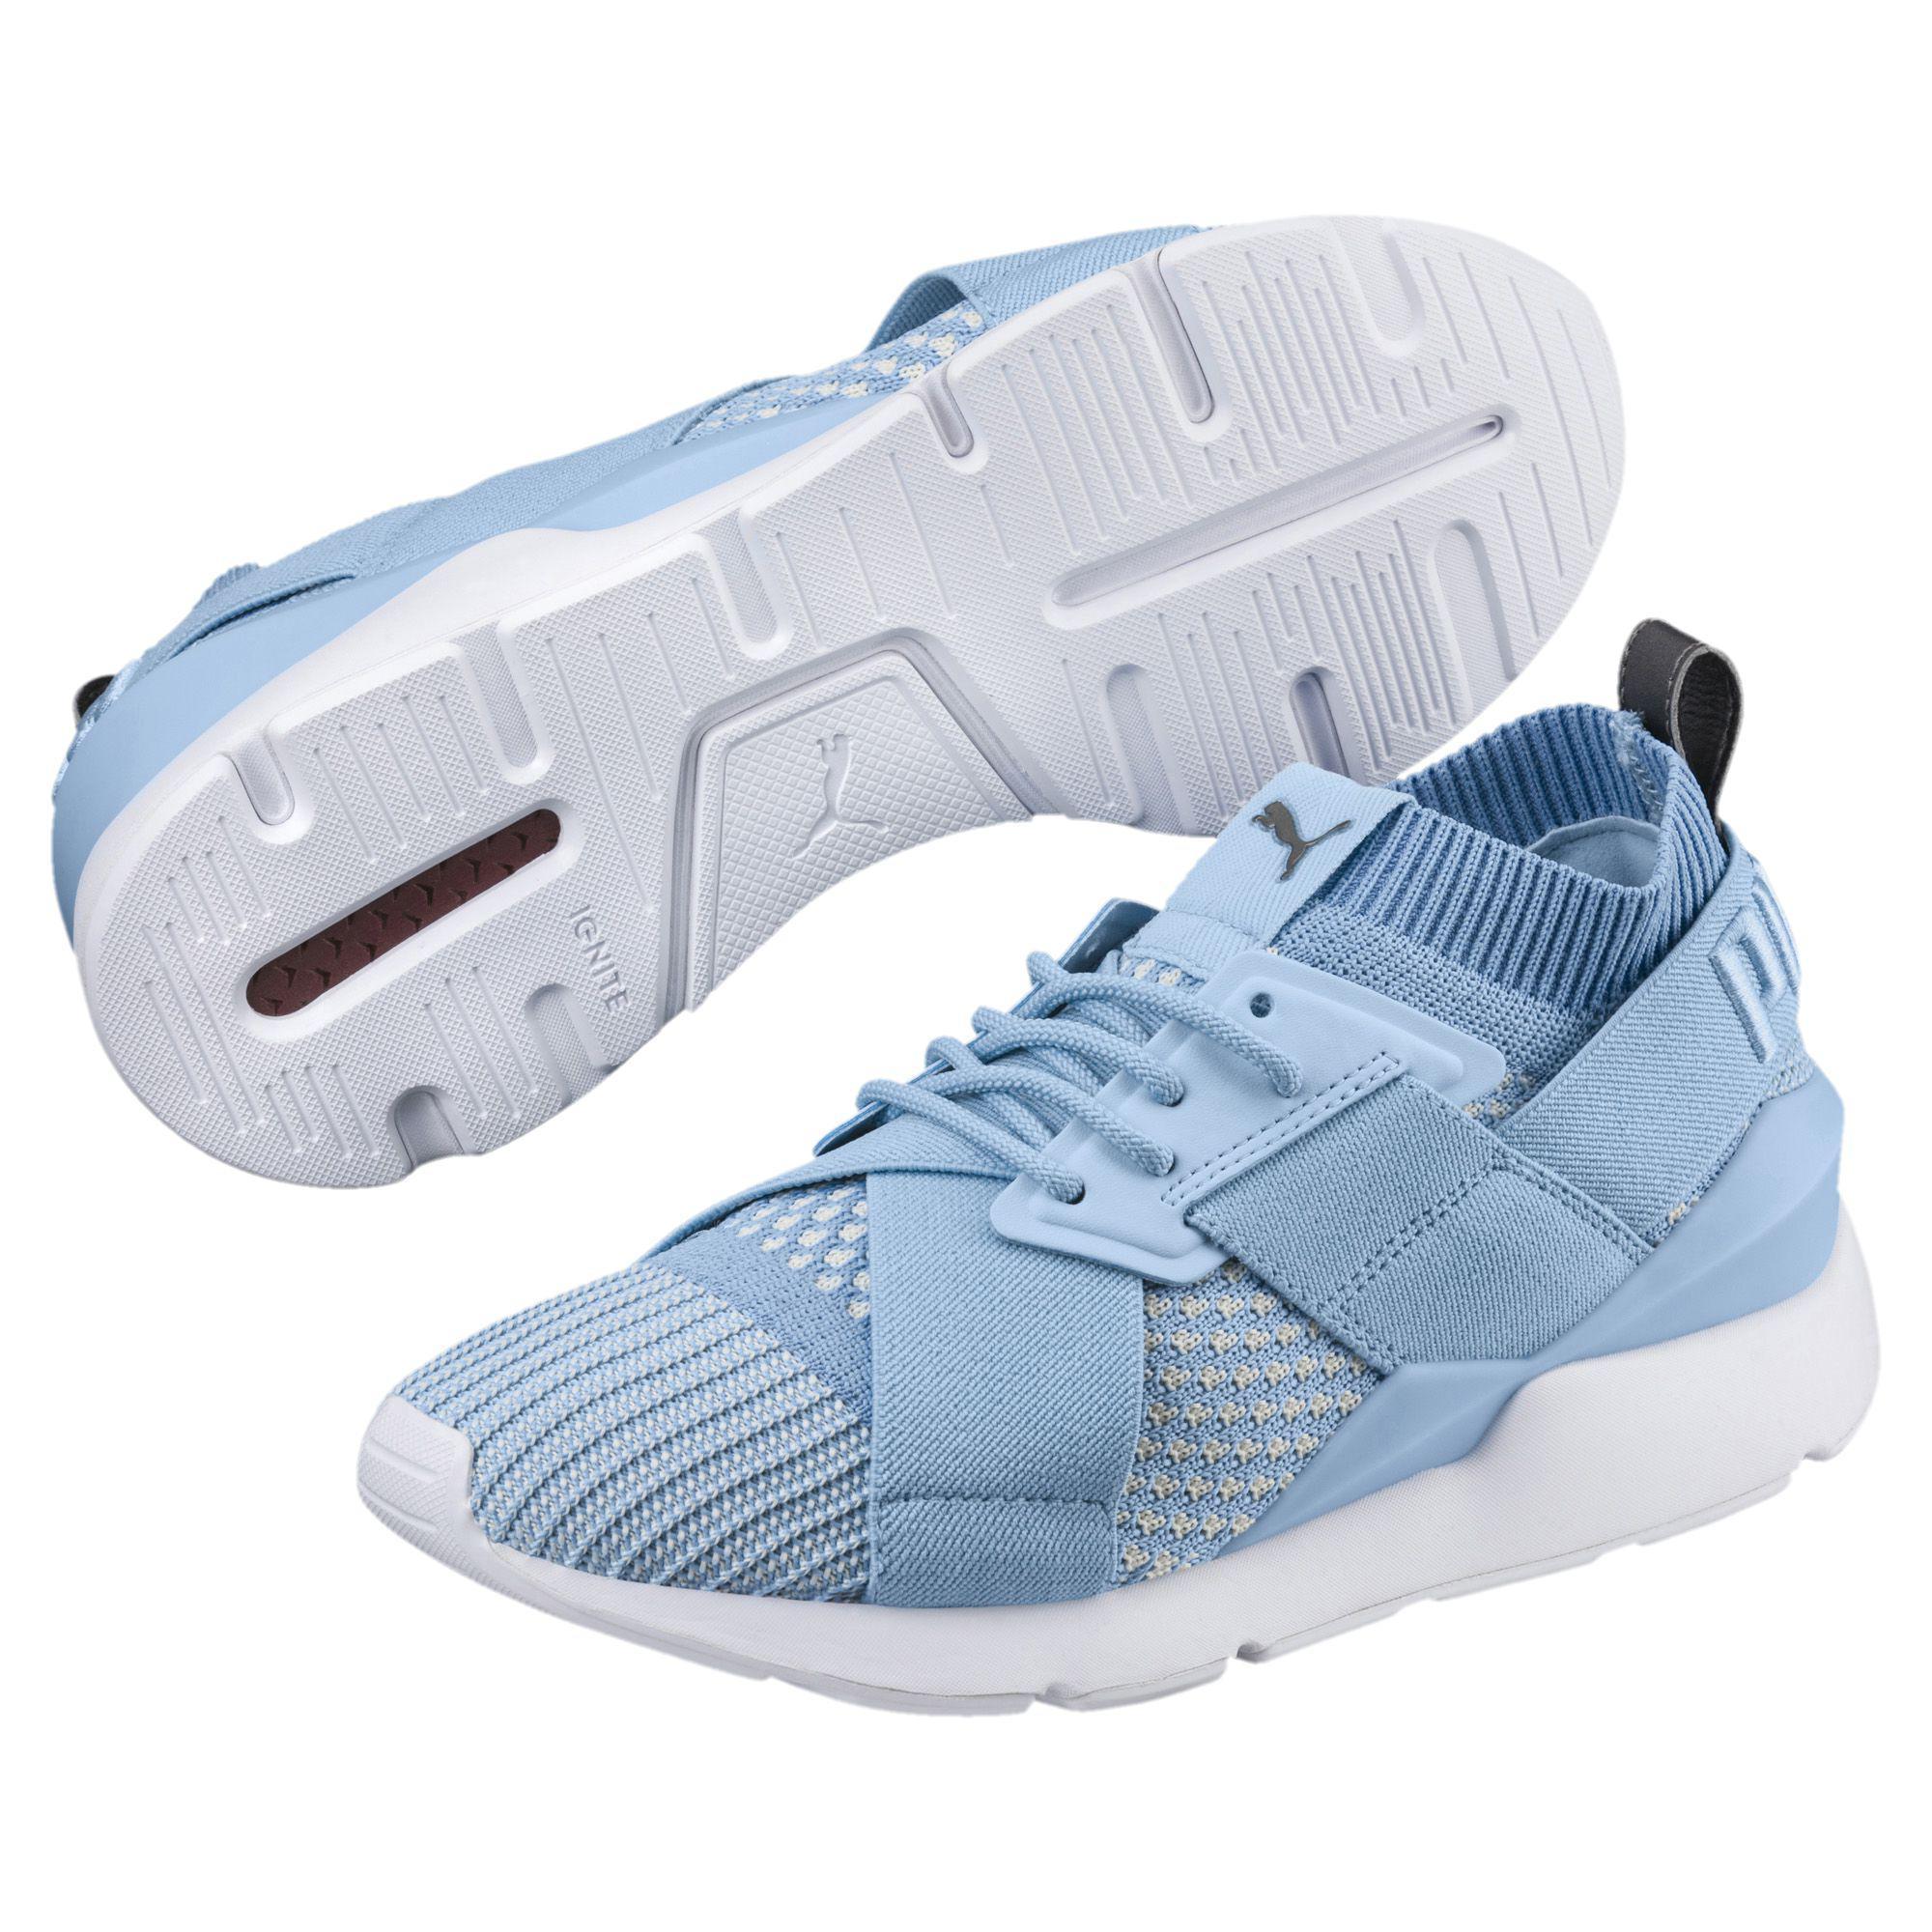 4e77396fce3012 PUMA - Blue Muse Evoknit Women s Sneakers - Lyst. View fullscreen